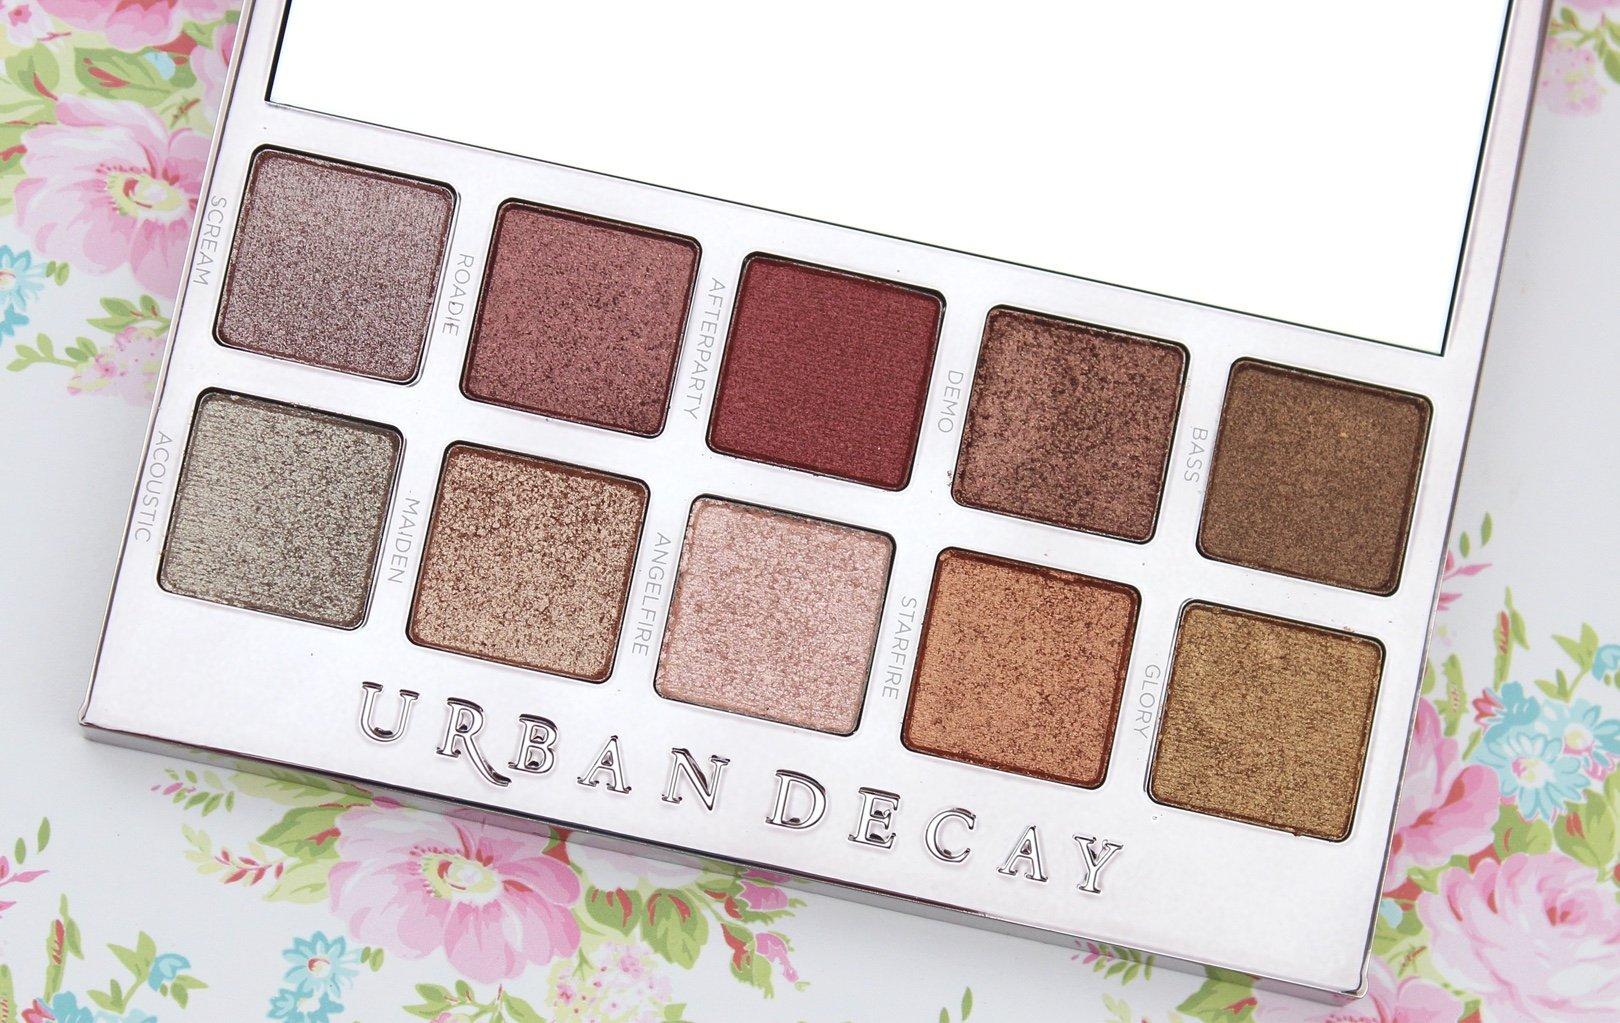 Urban Decay Heavy Metals Metallic Eyeshadow Palette bbloggers